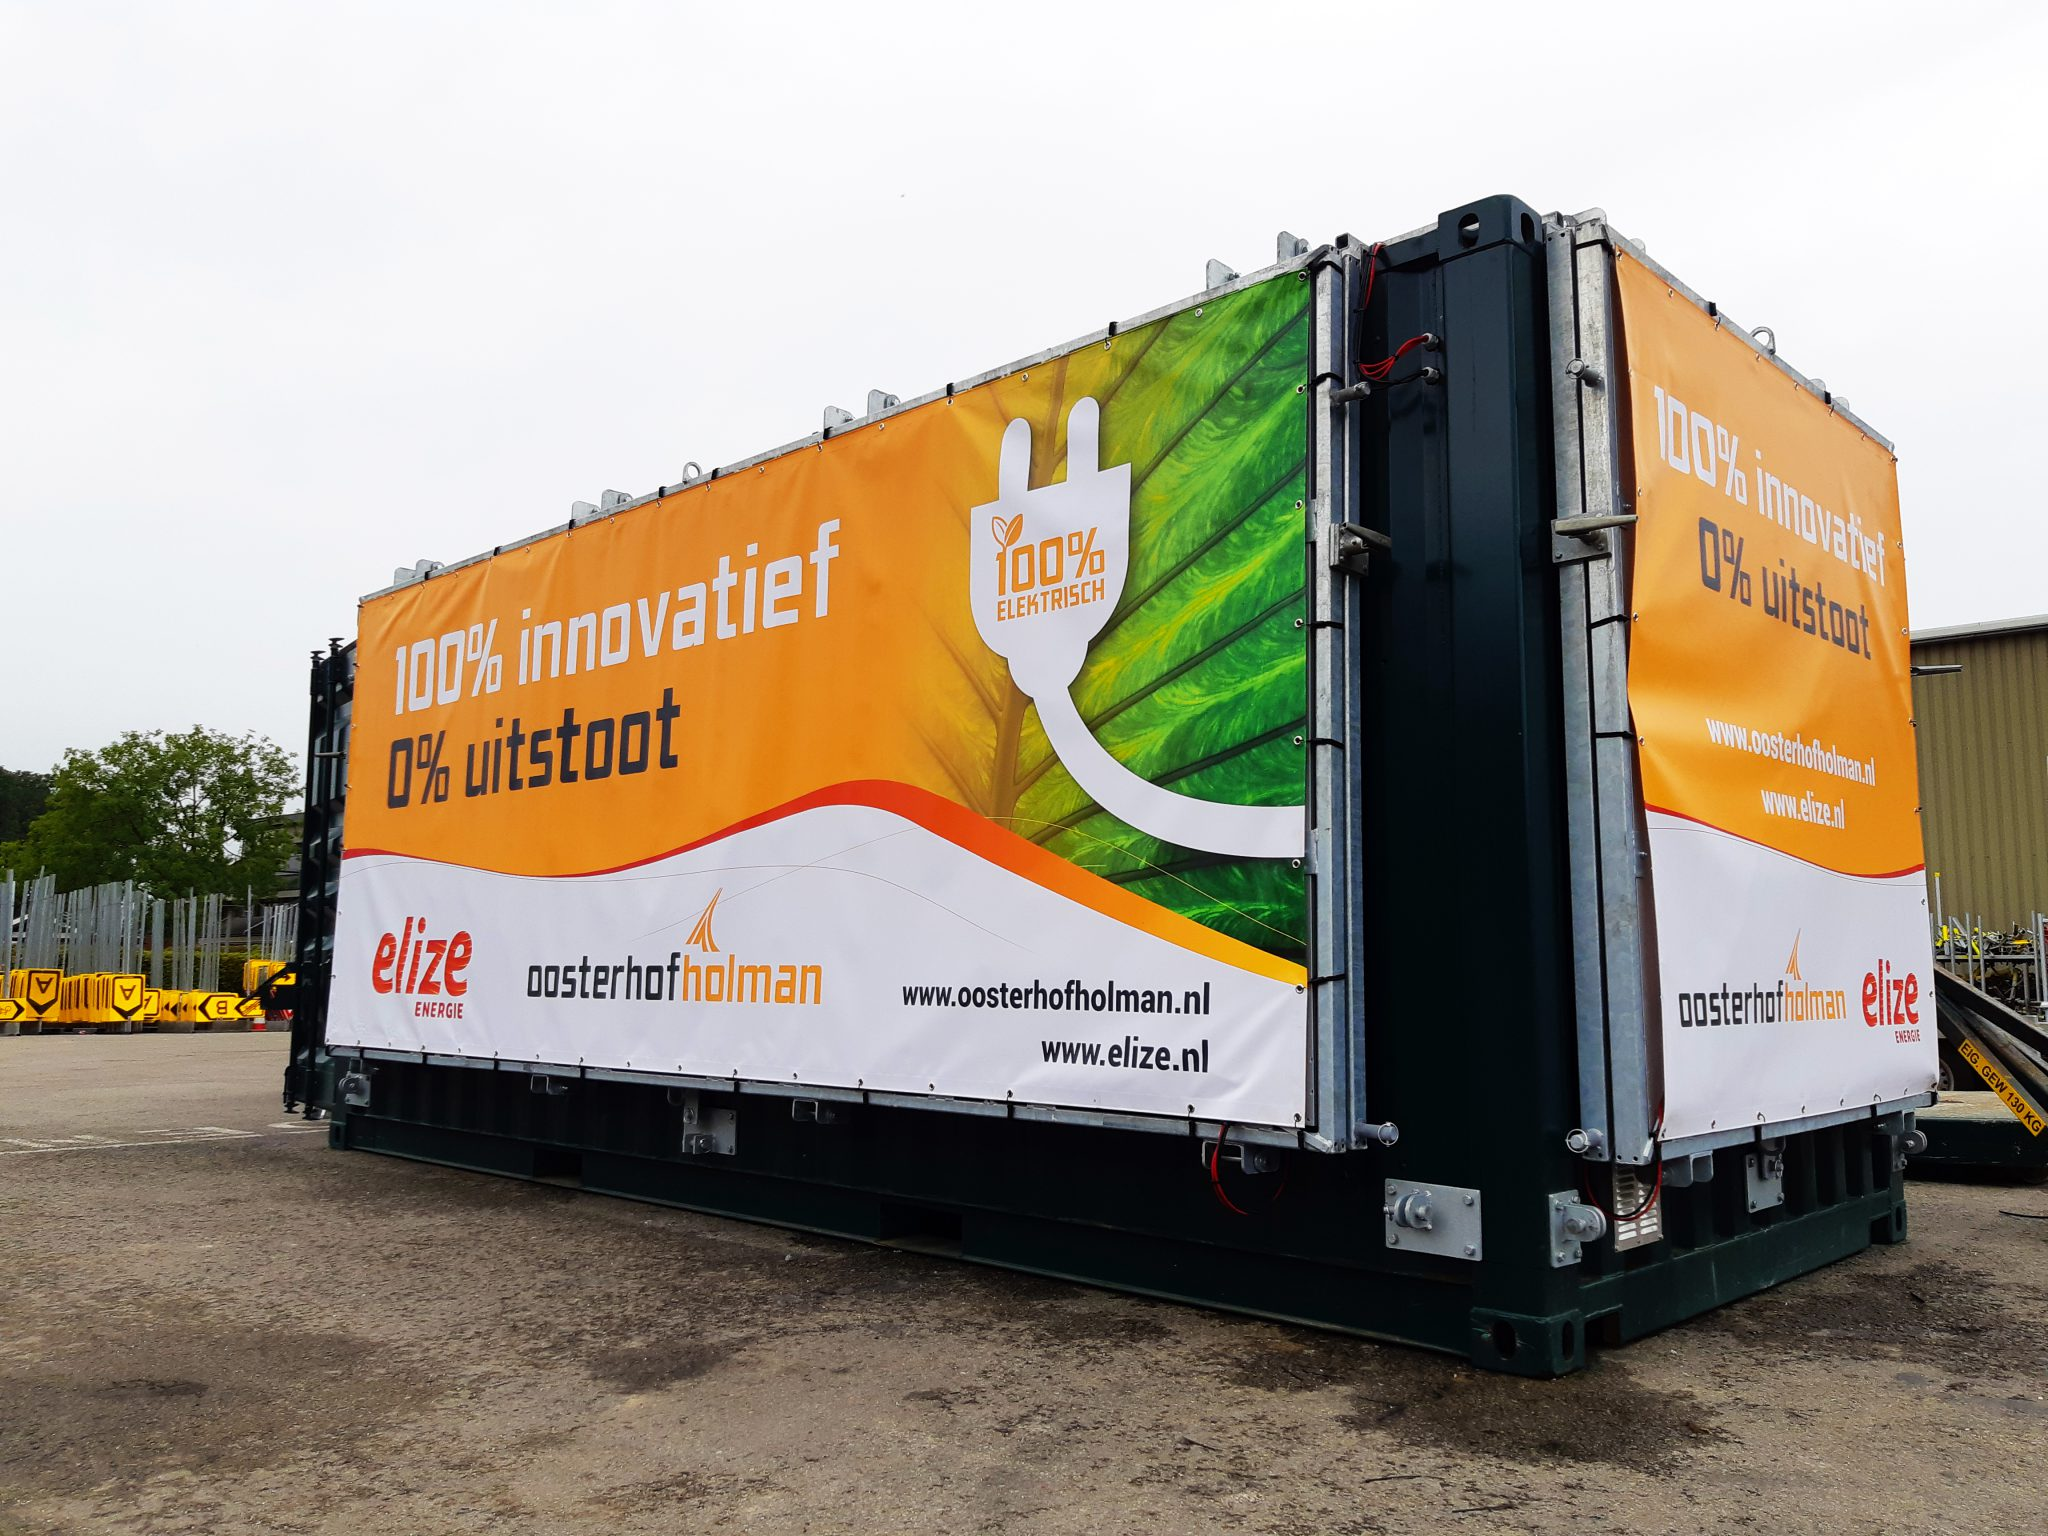 Energiecontainer. Foto: Oosterhof Holman